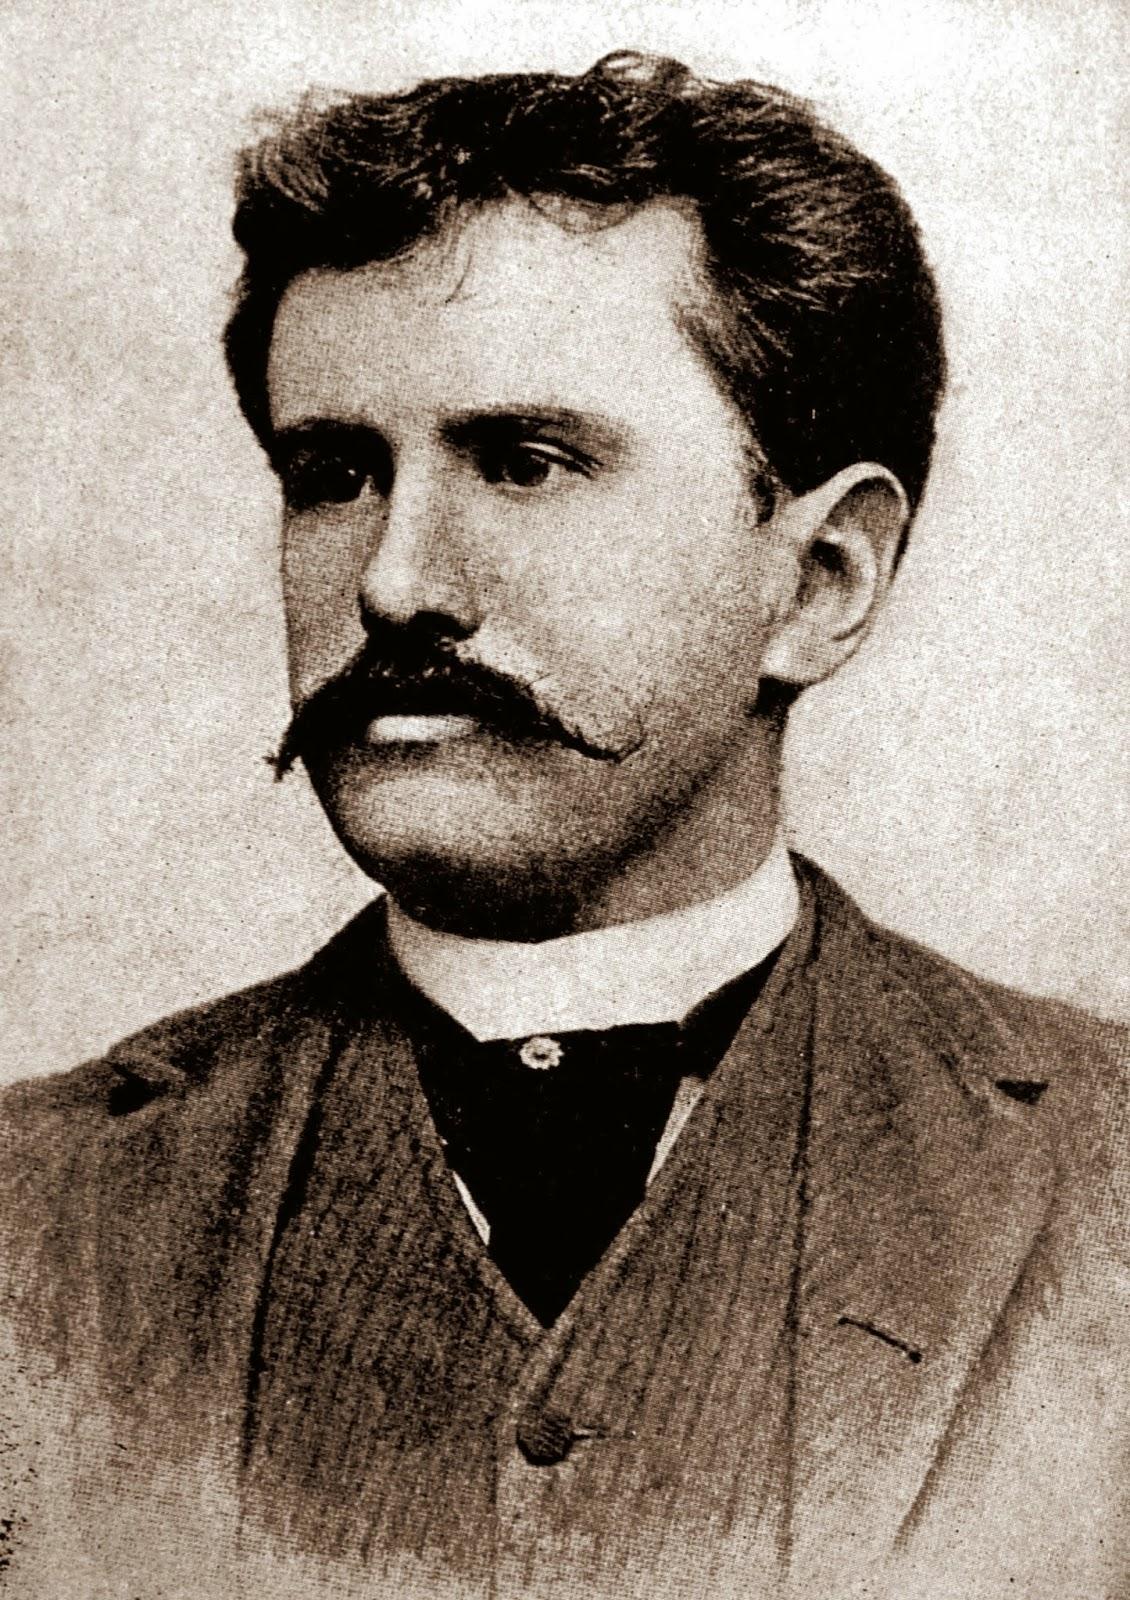 O Henry - Humorist.  Image source: http://upload.wikimedia.org/wikipedia/commons/5/55/William_Sydney_Porter.jpg